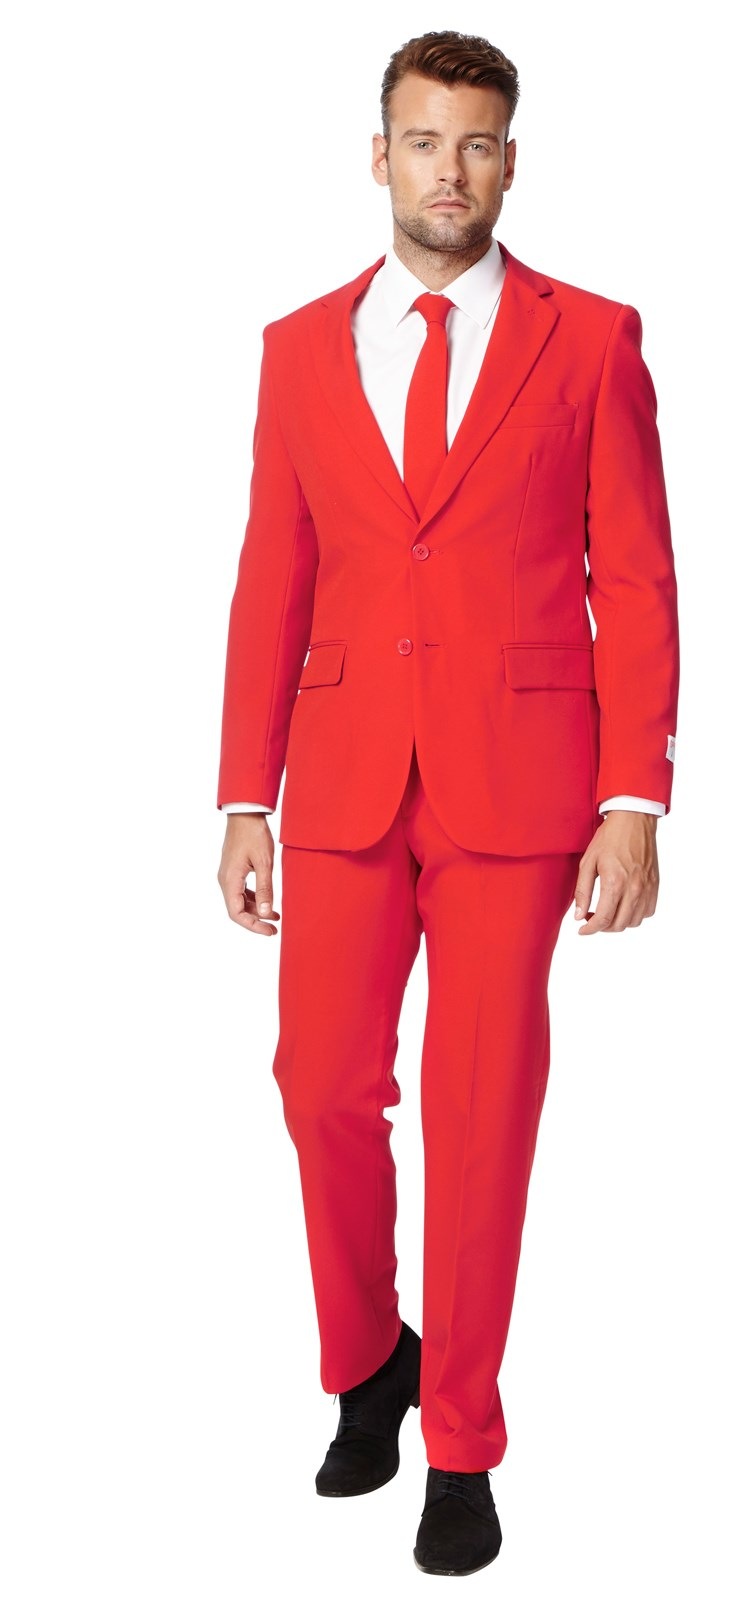 Devil Adult Costume 37